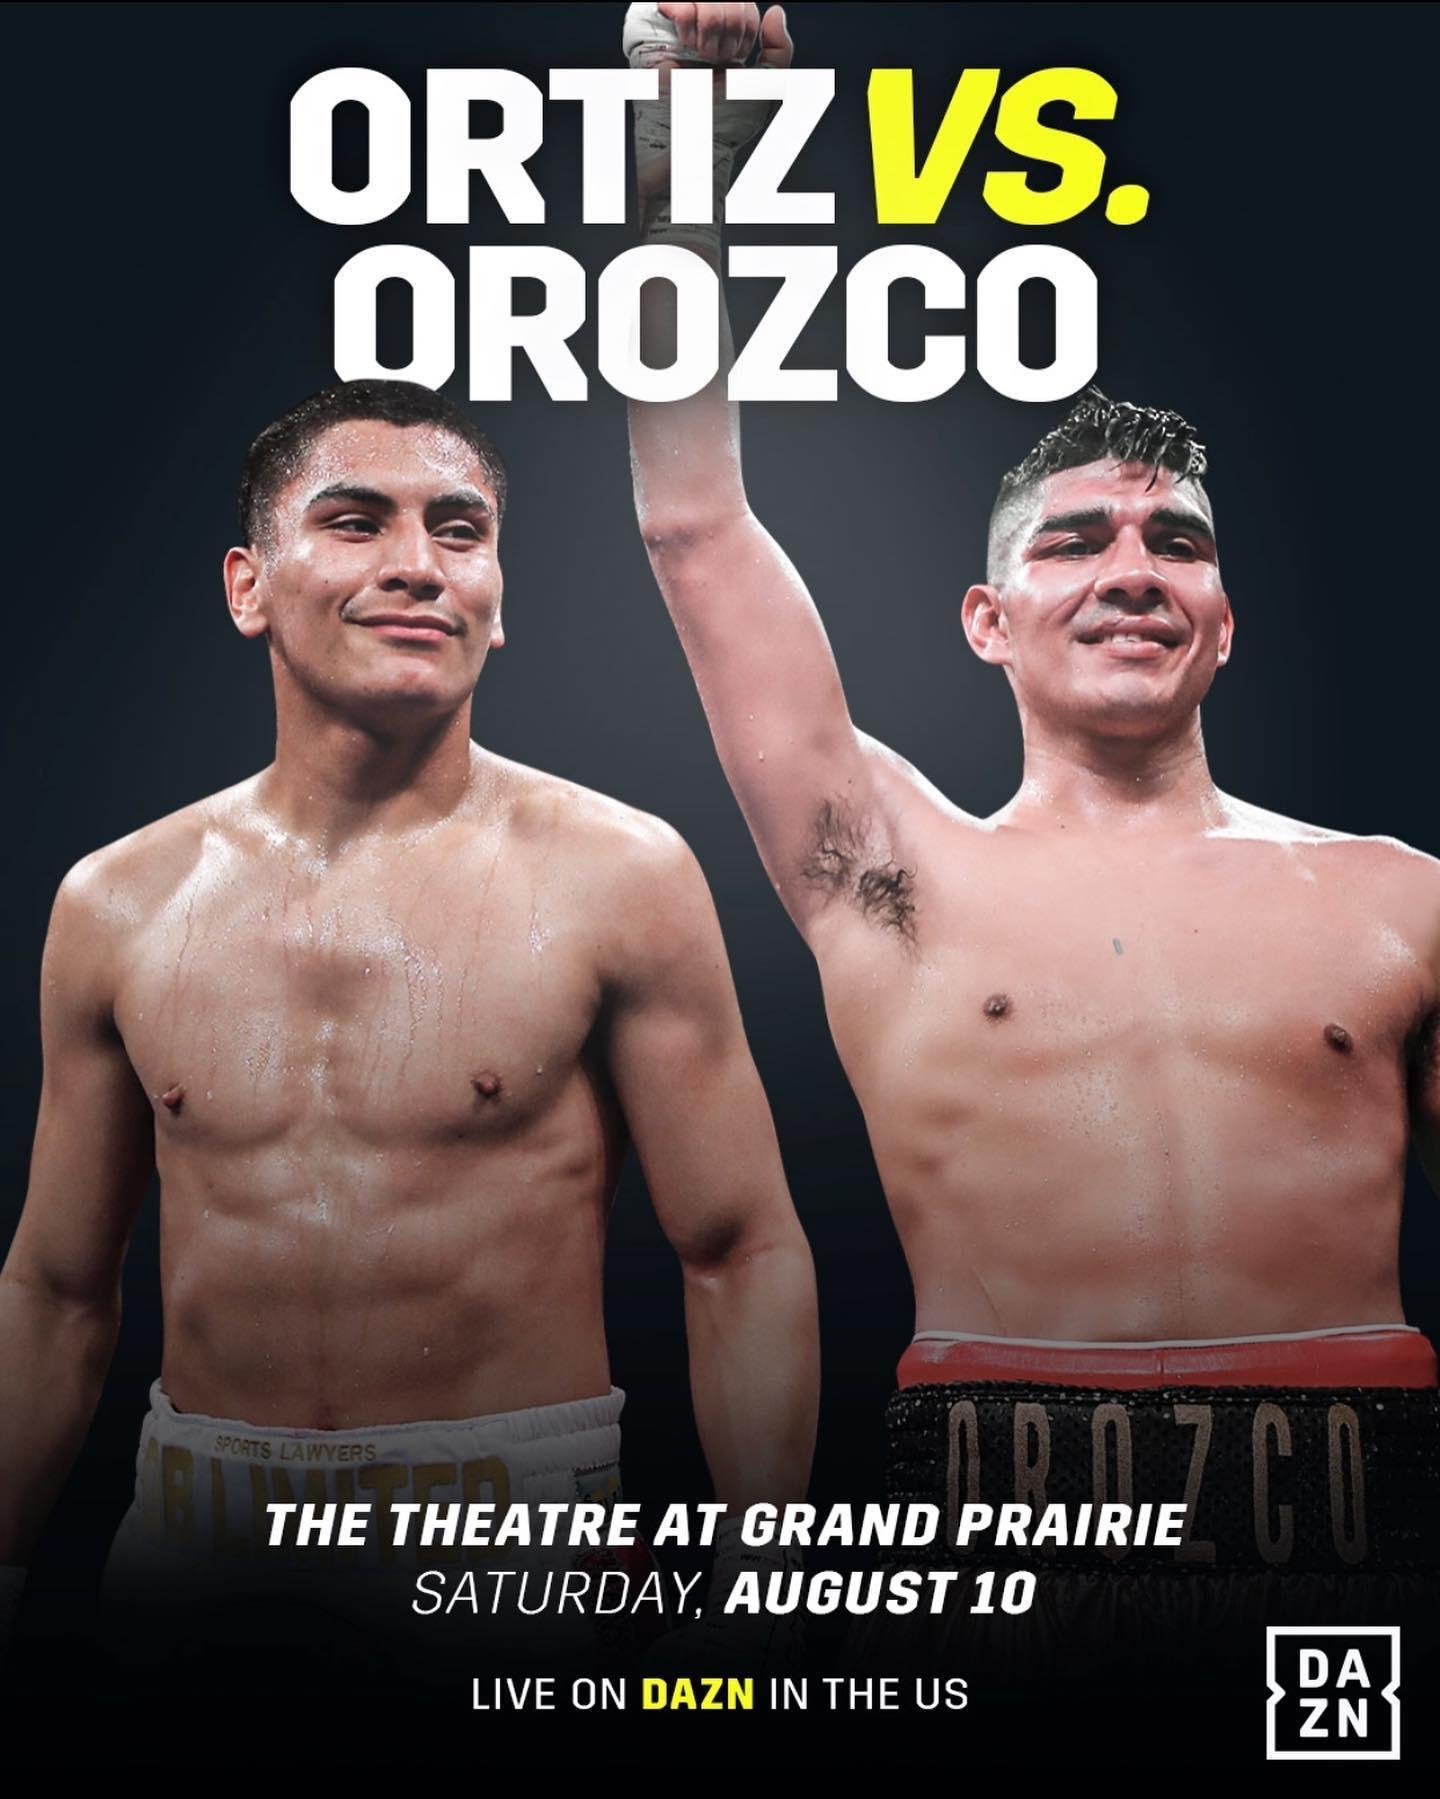 Vergil Ortiz vs. Antonio Orozco